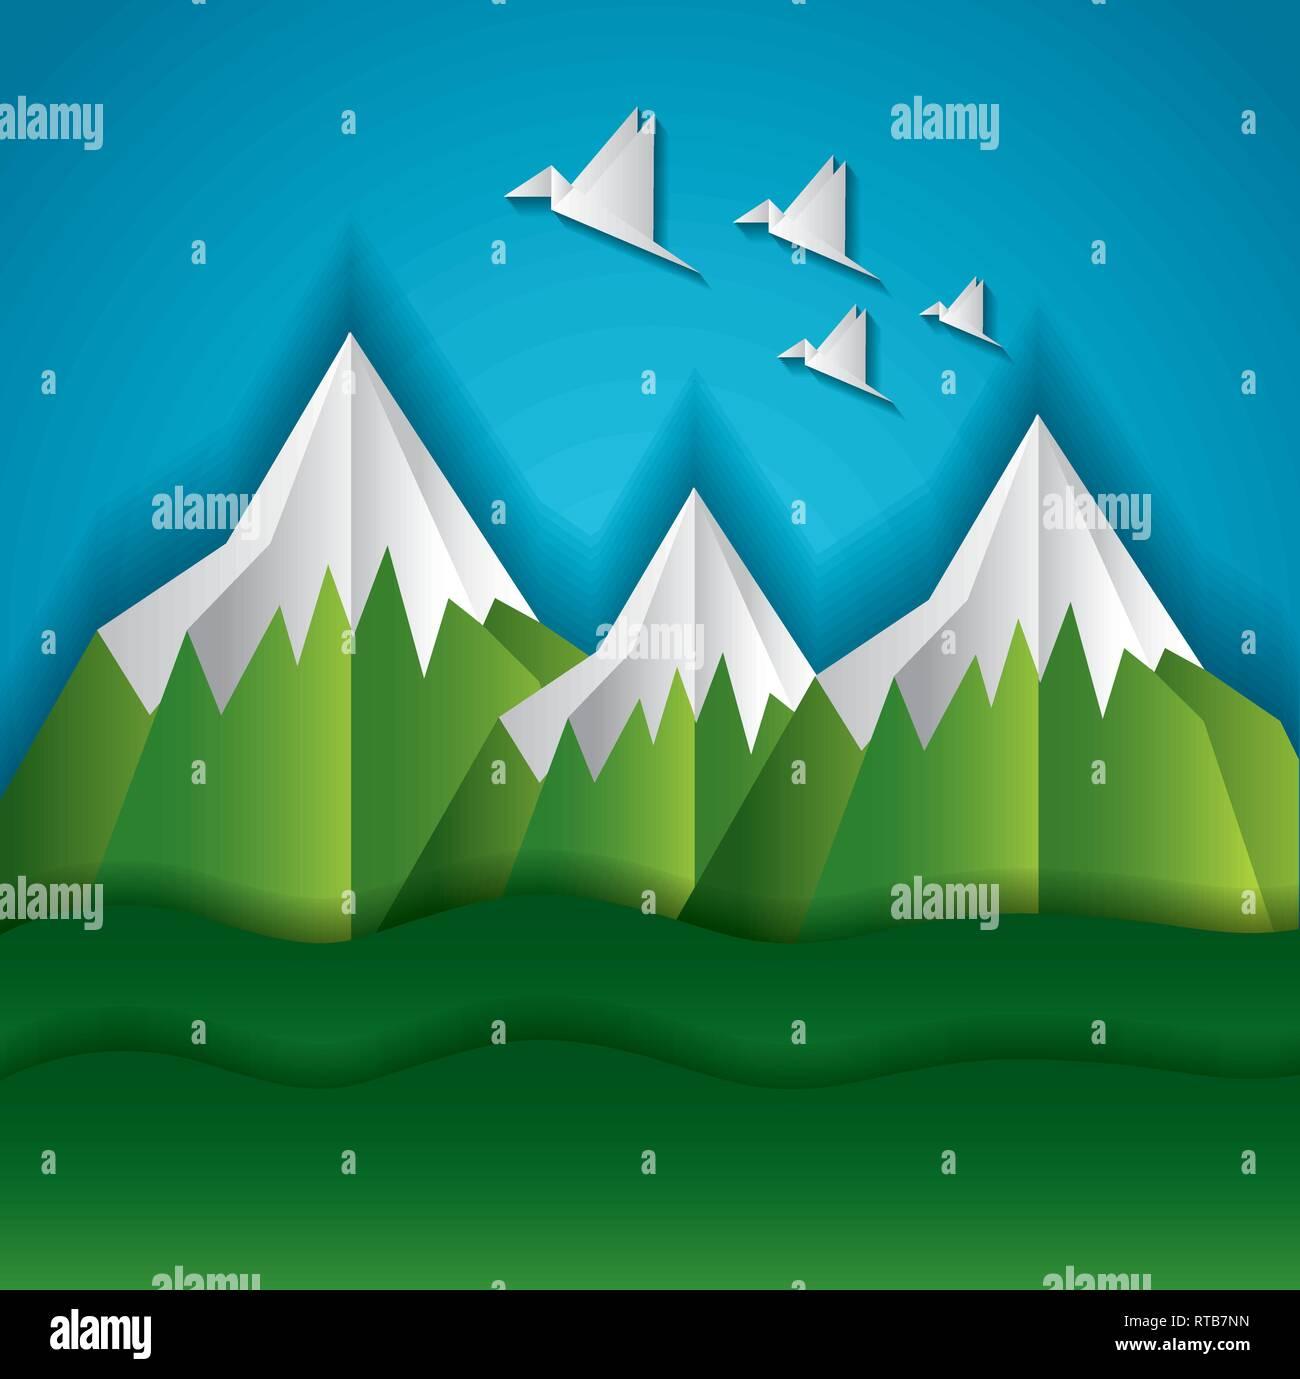 paper origami landscape - Stock Vector